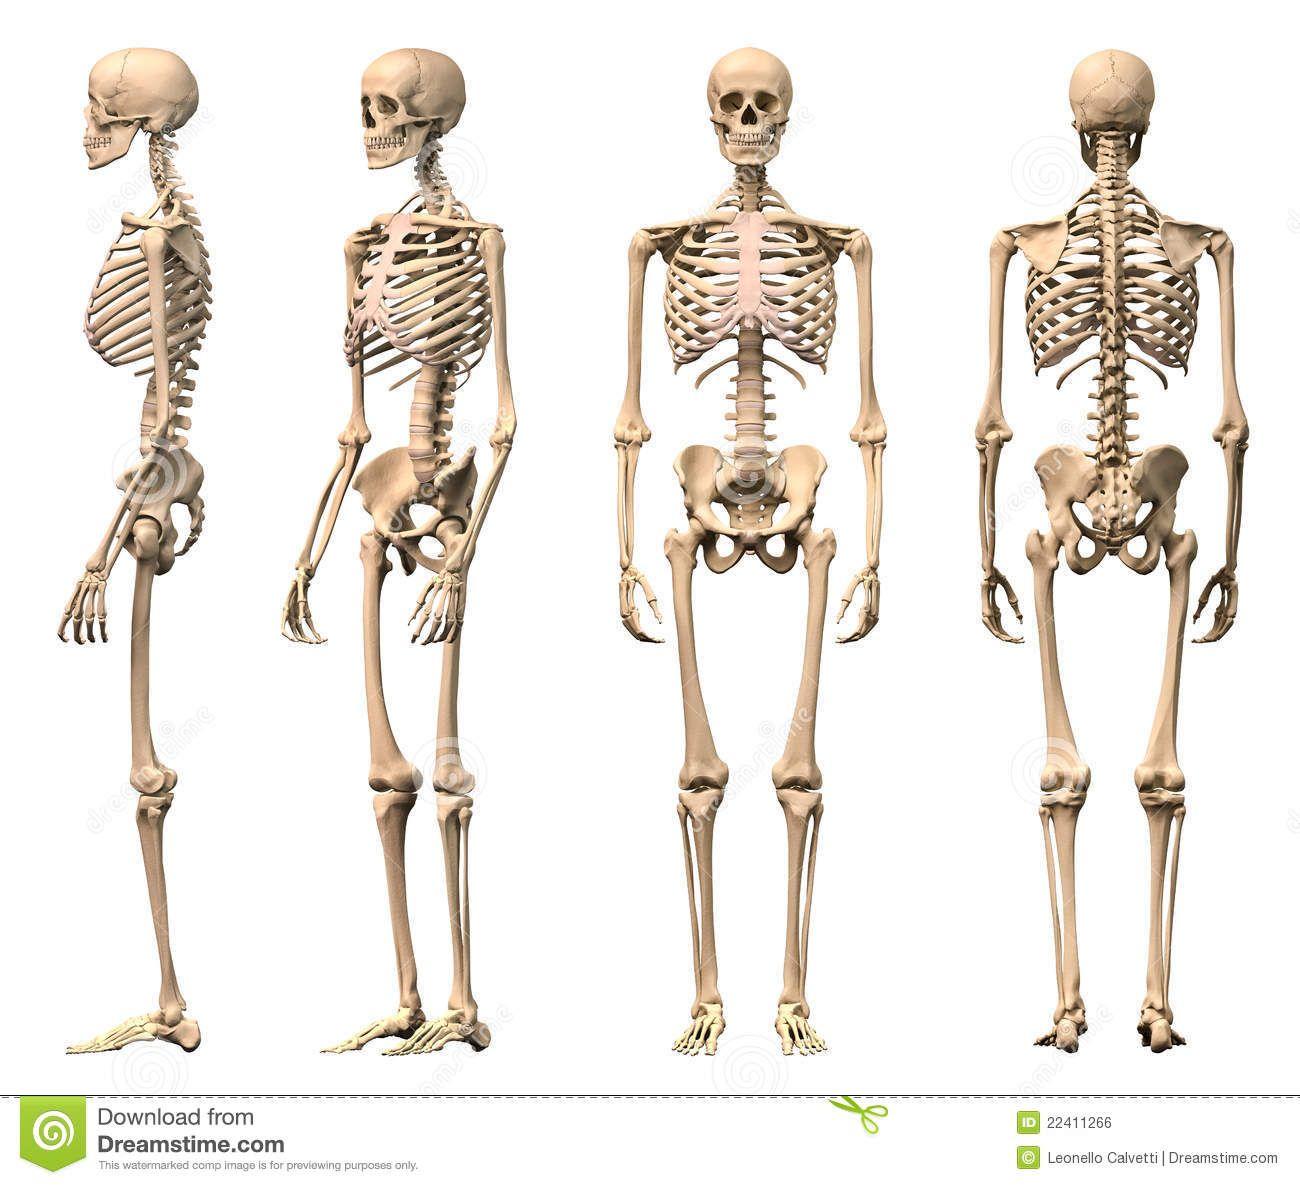 mannelijkmenselijkskeletviermeningen22411266.jpg